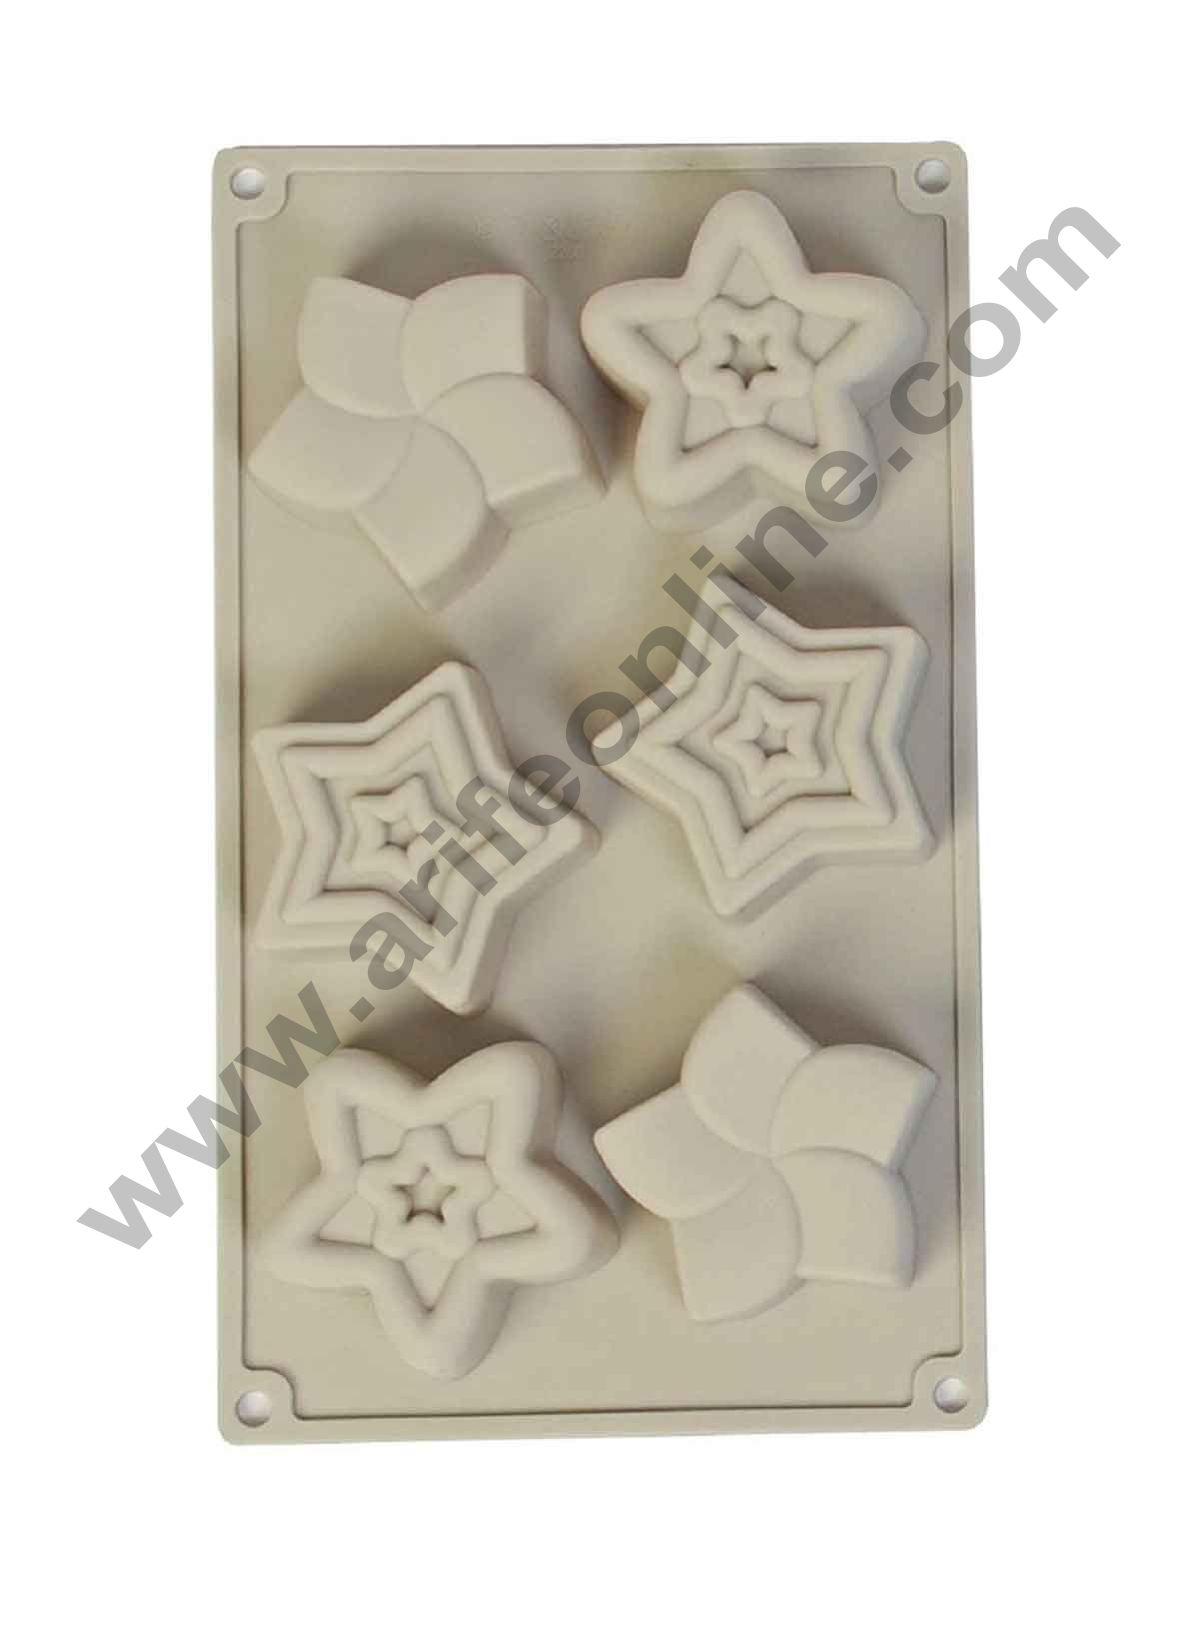 Cake Decor Silicon 6 Cavity, Star Shape, Non Sticky Mold for soap,Chocolate, Fondant Sugar bakeware Mold